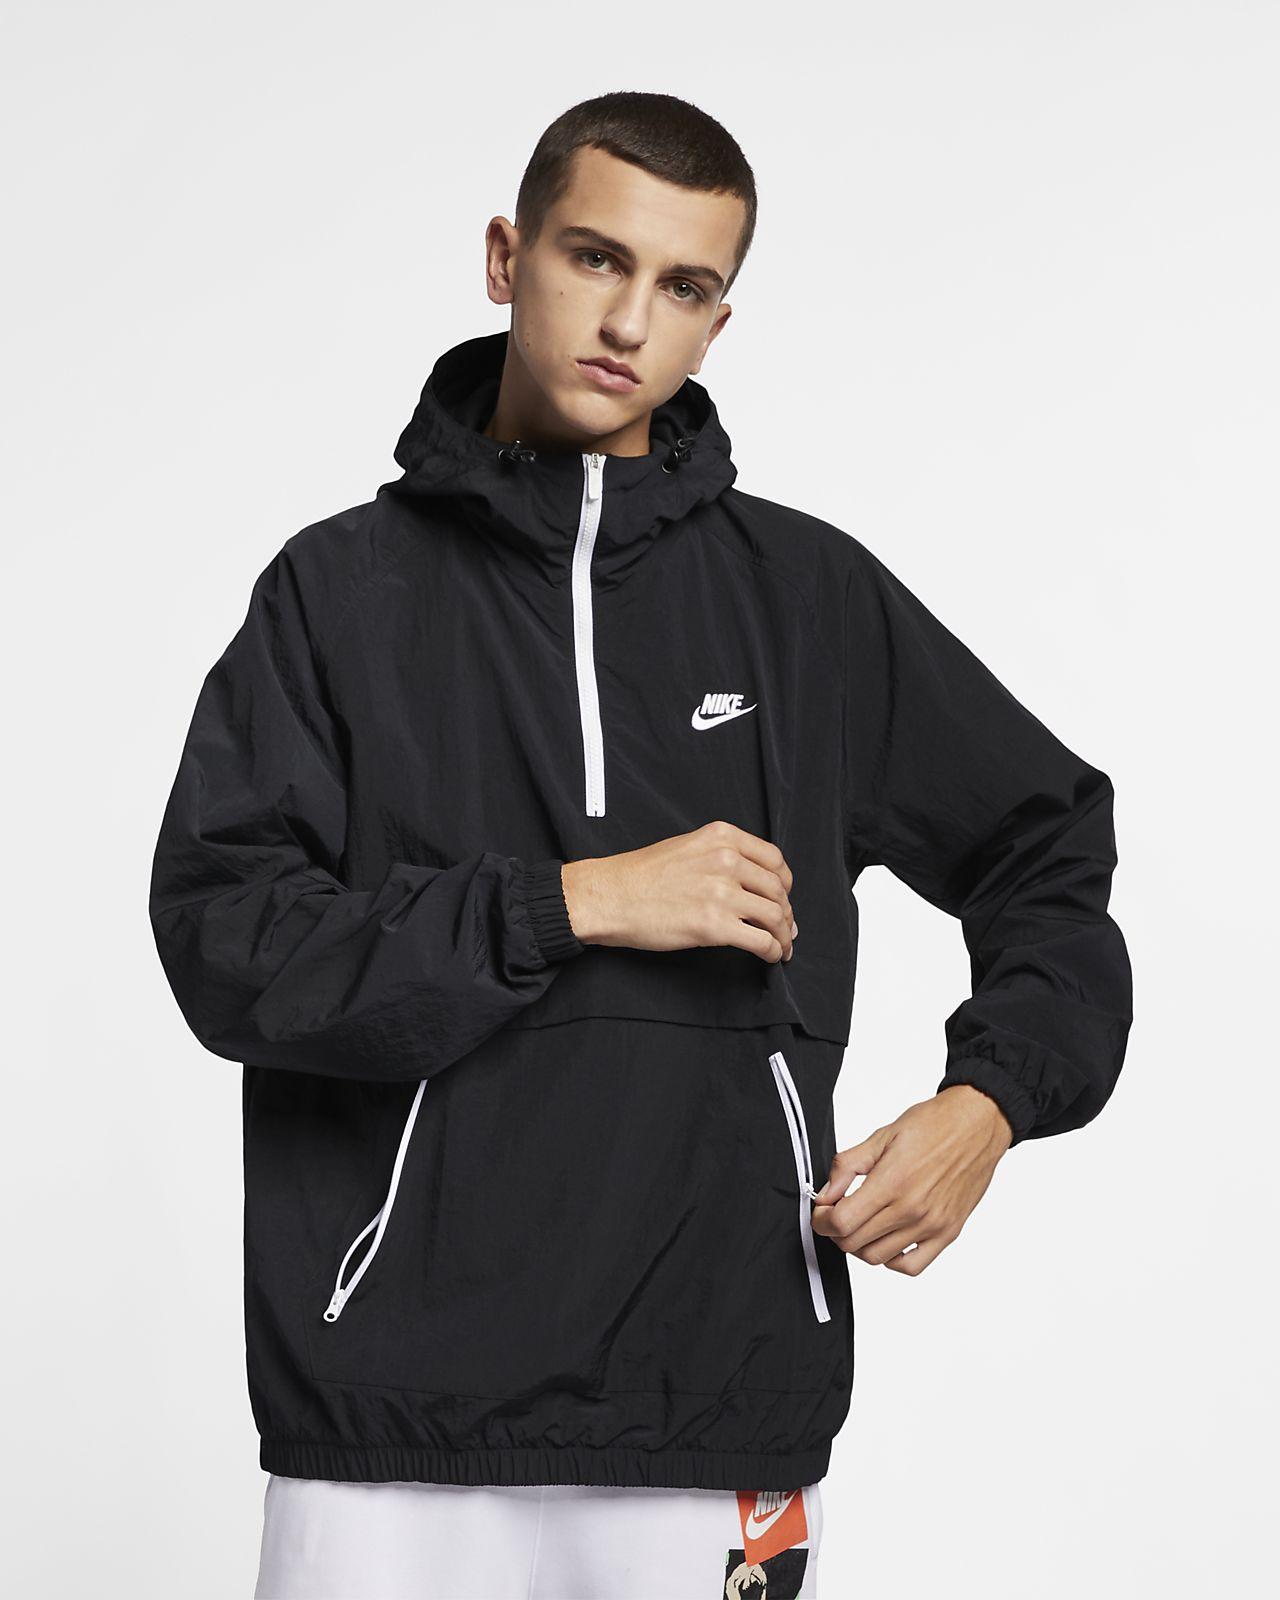 Nike Sportswear Geweven anorak met capuchon